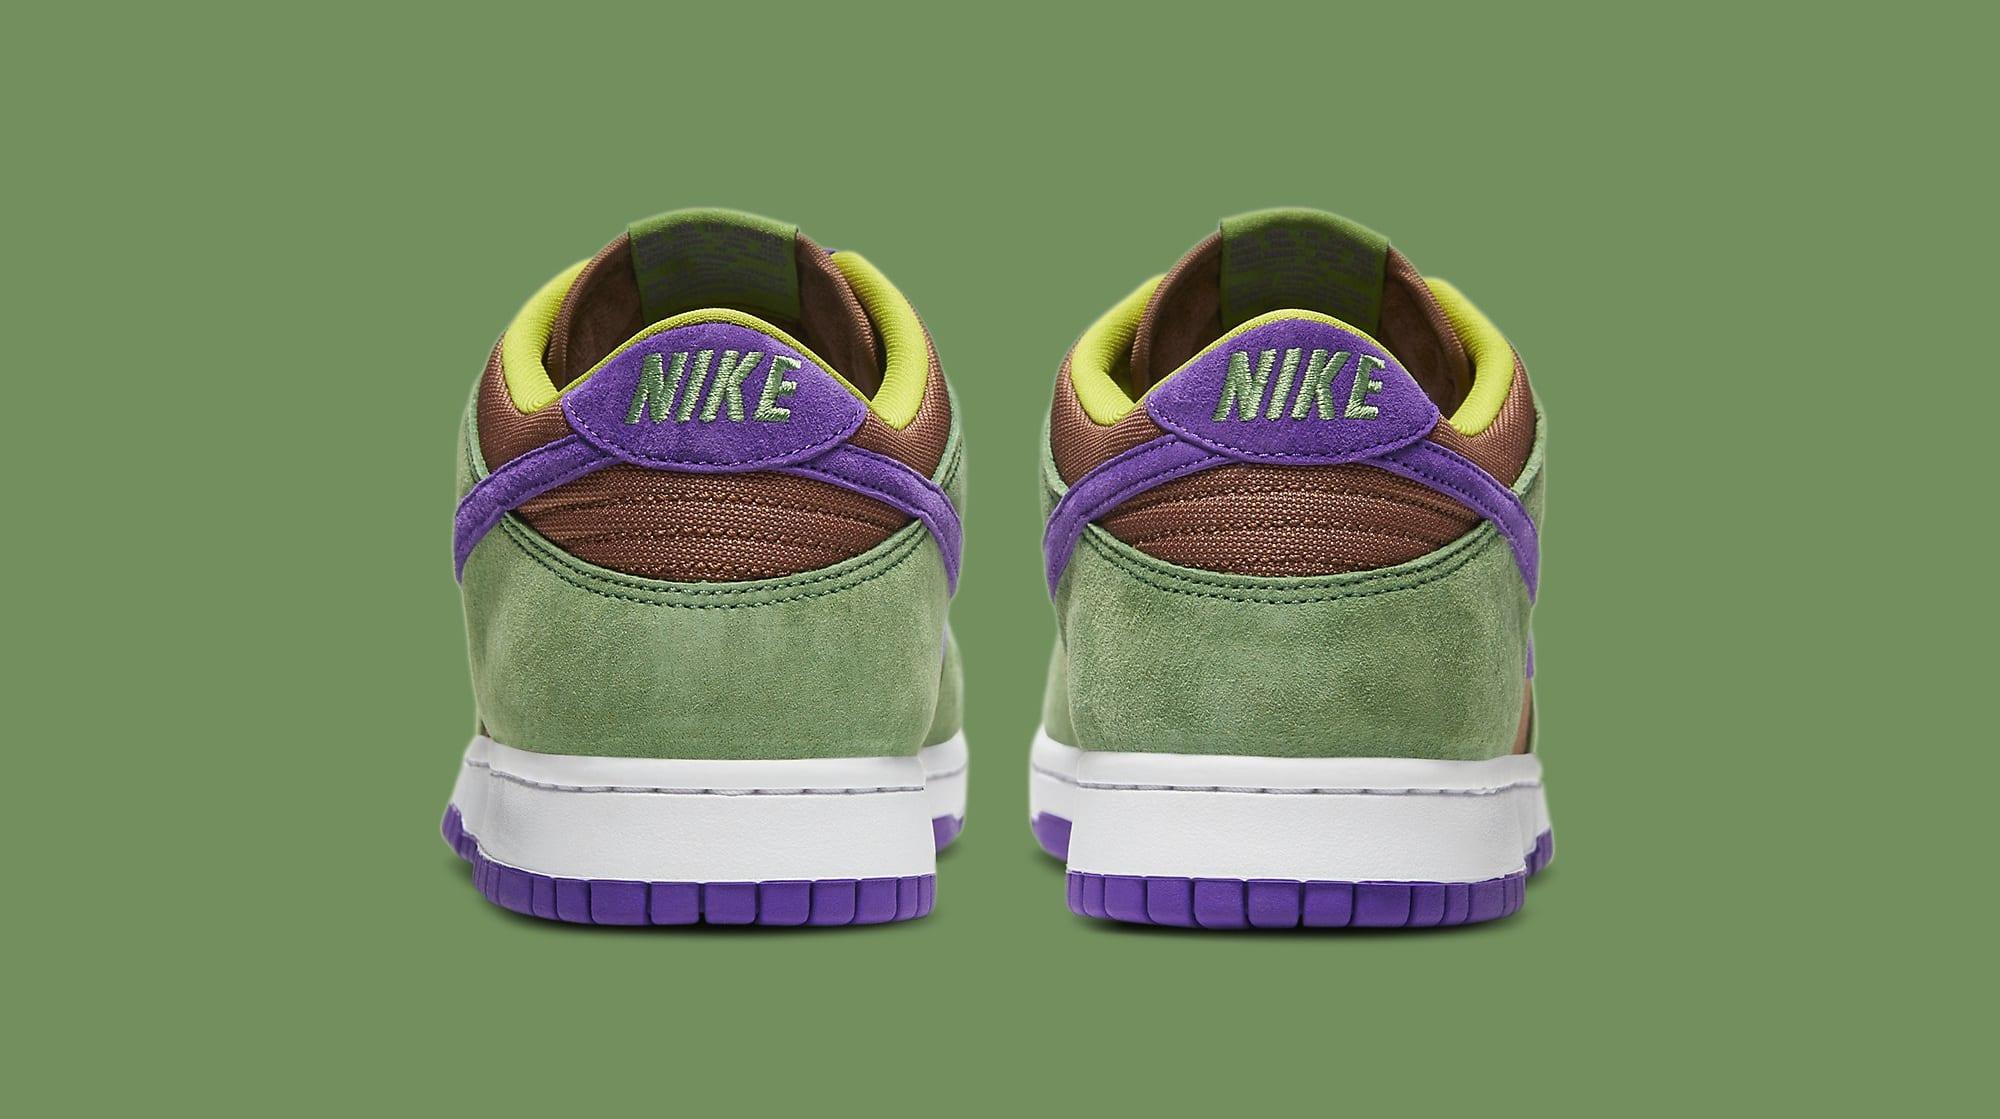 Nike Dunk Low 'Veneer' 2020 DA1469-200 Heel